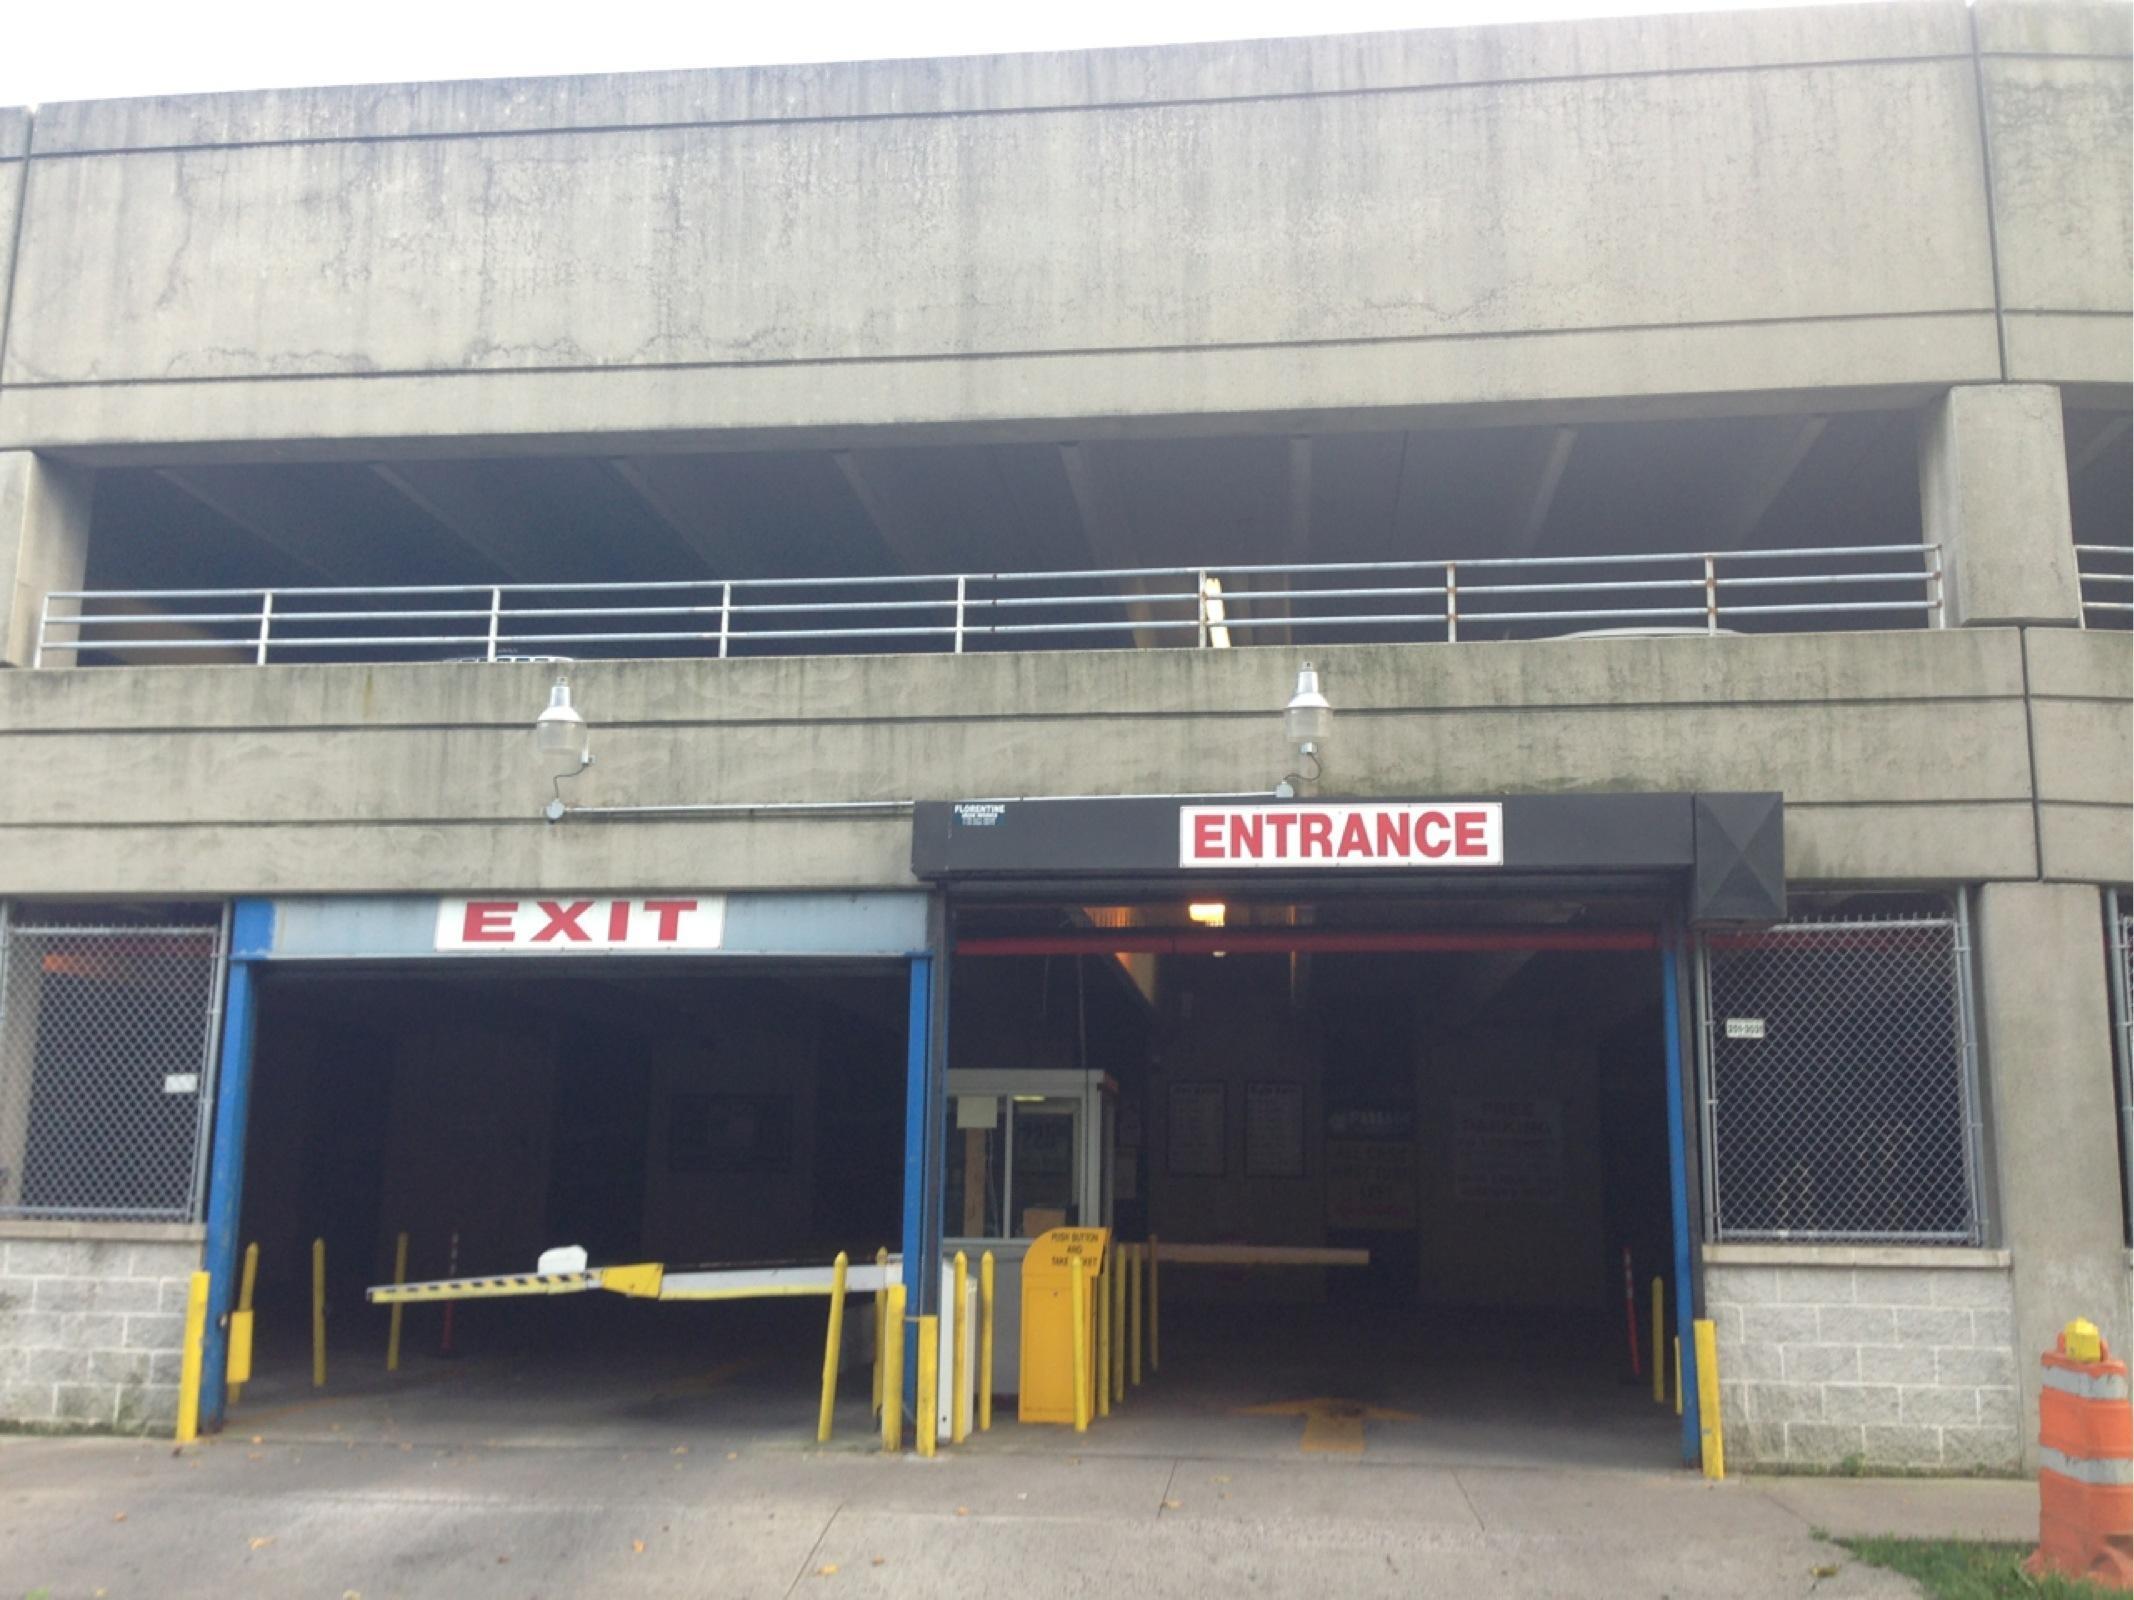 2027 emmos ave garage parking in new york parkme for New york parking garage